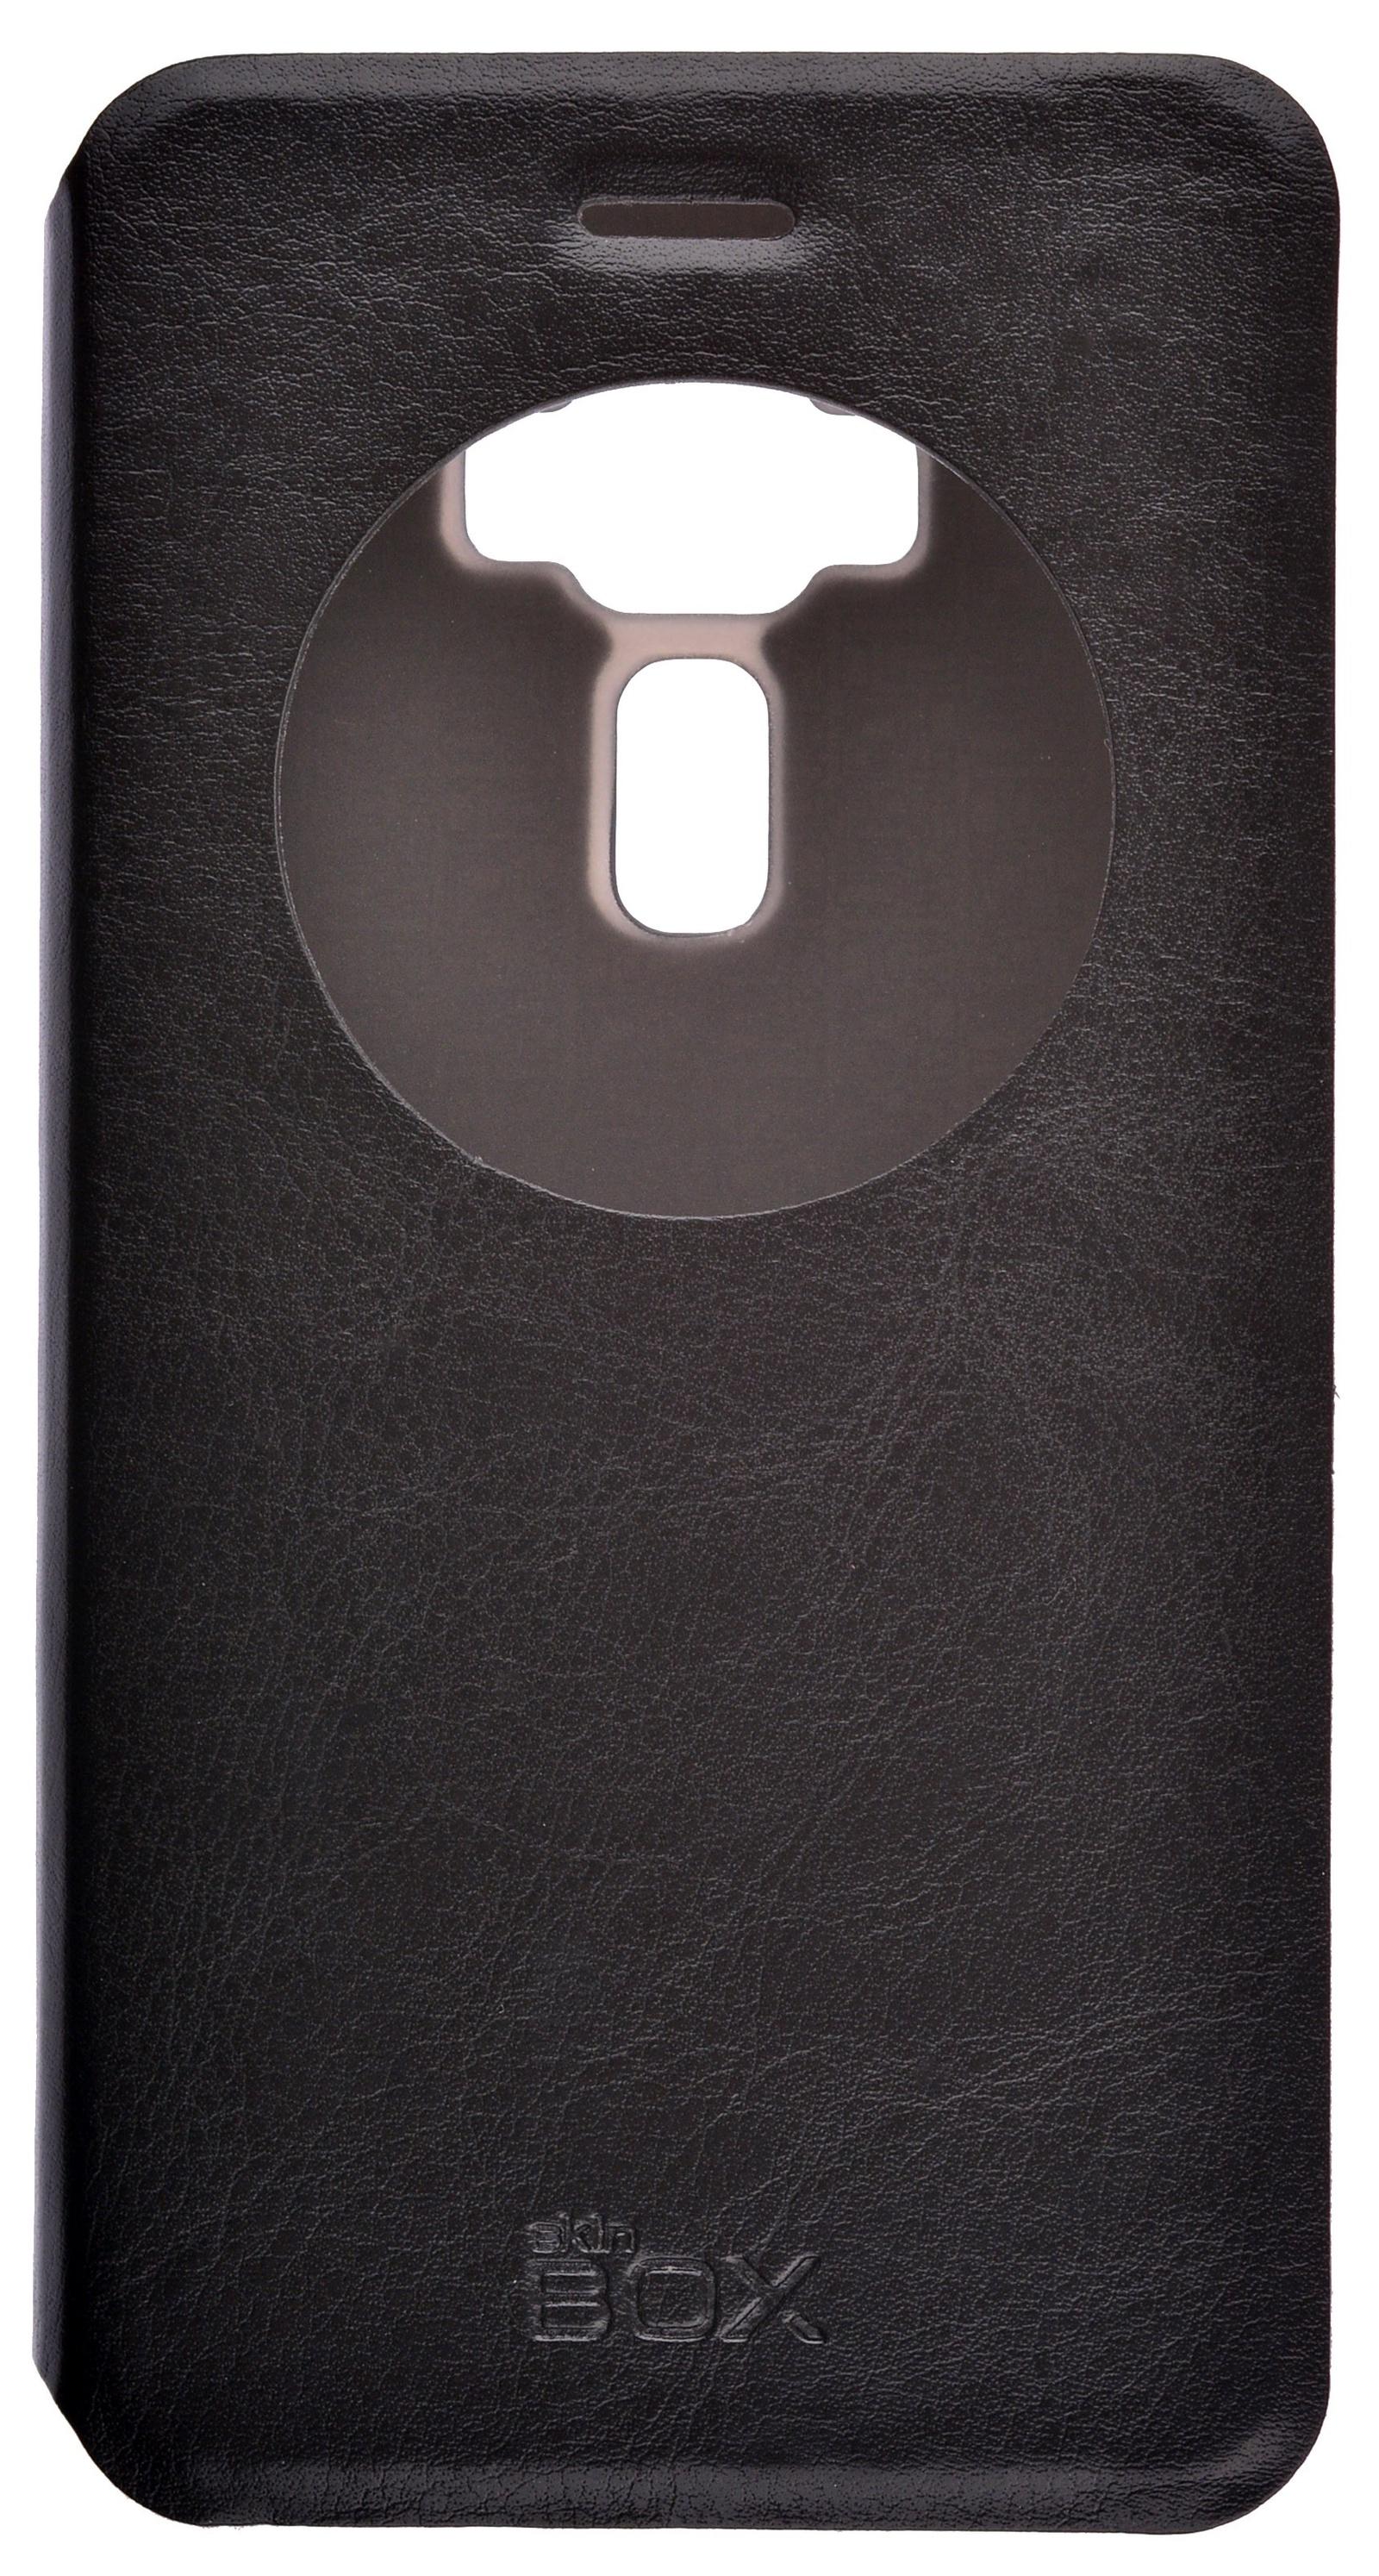 Чехол для сотового телефона skinBOX Lux AW, 4630042525351, черный roar aw чехол для asus zenfone 4 a400cg white